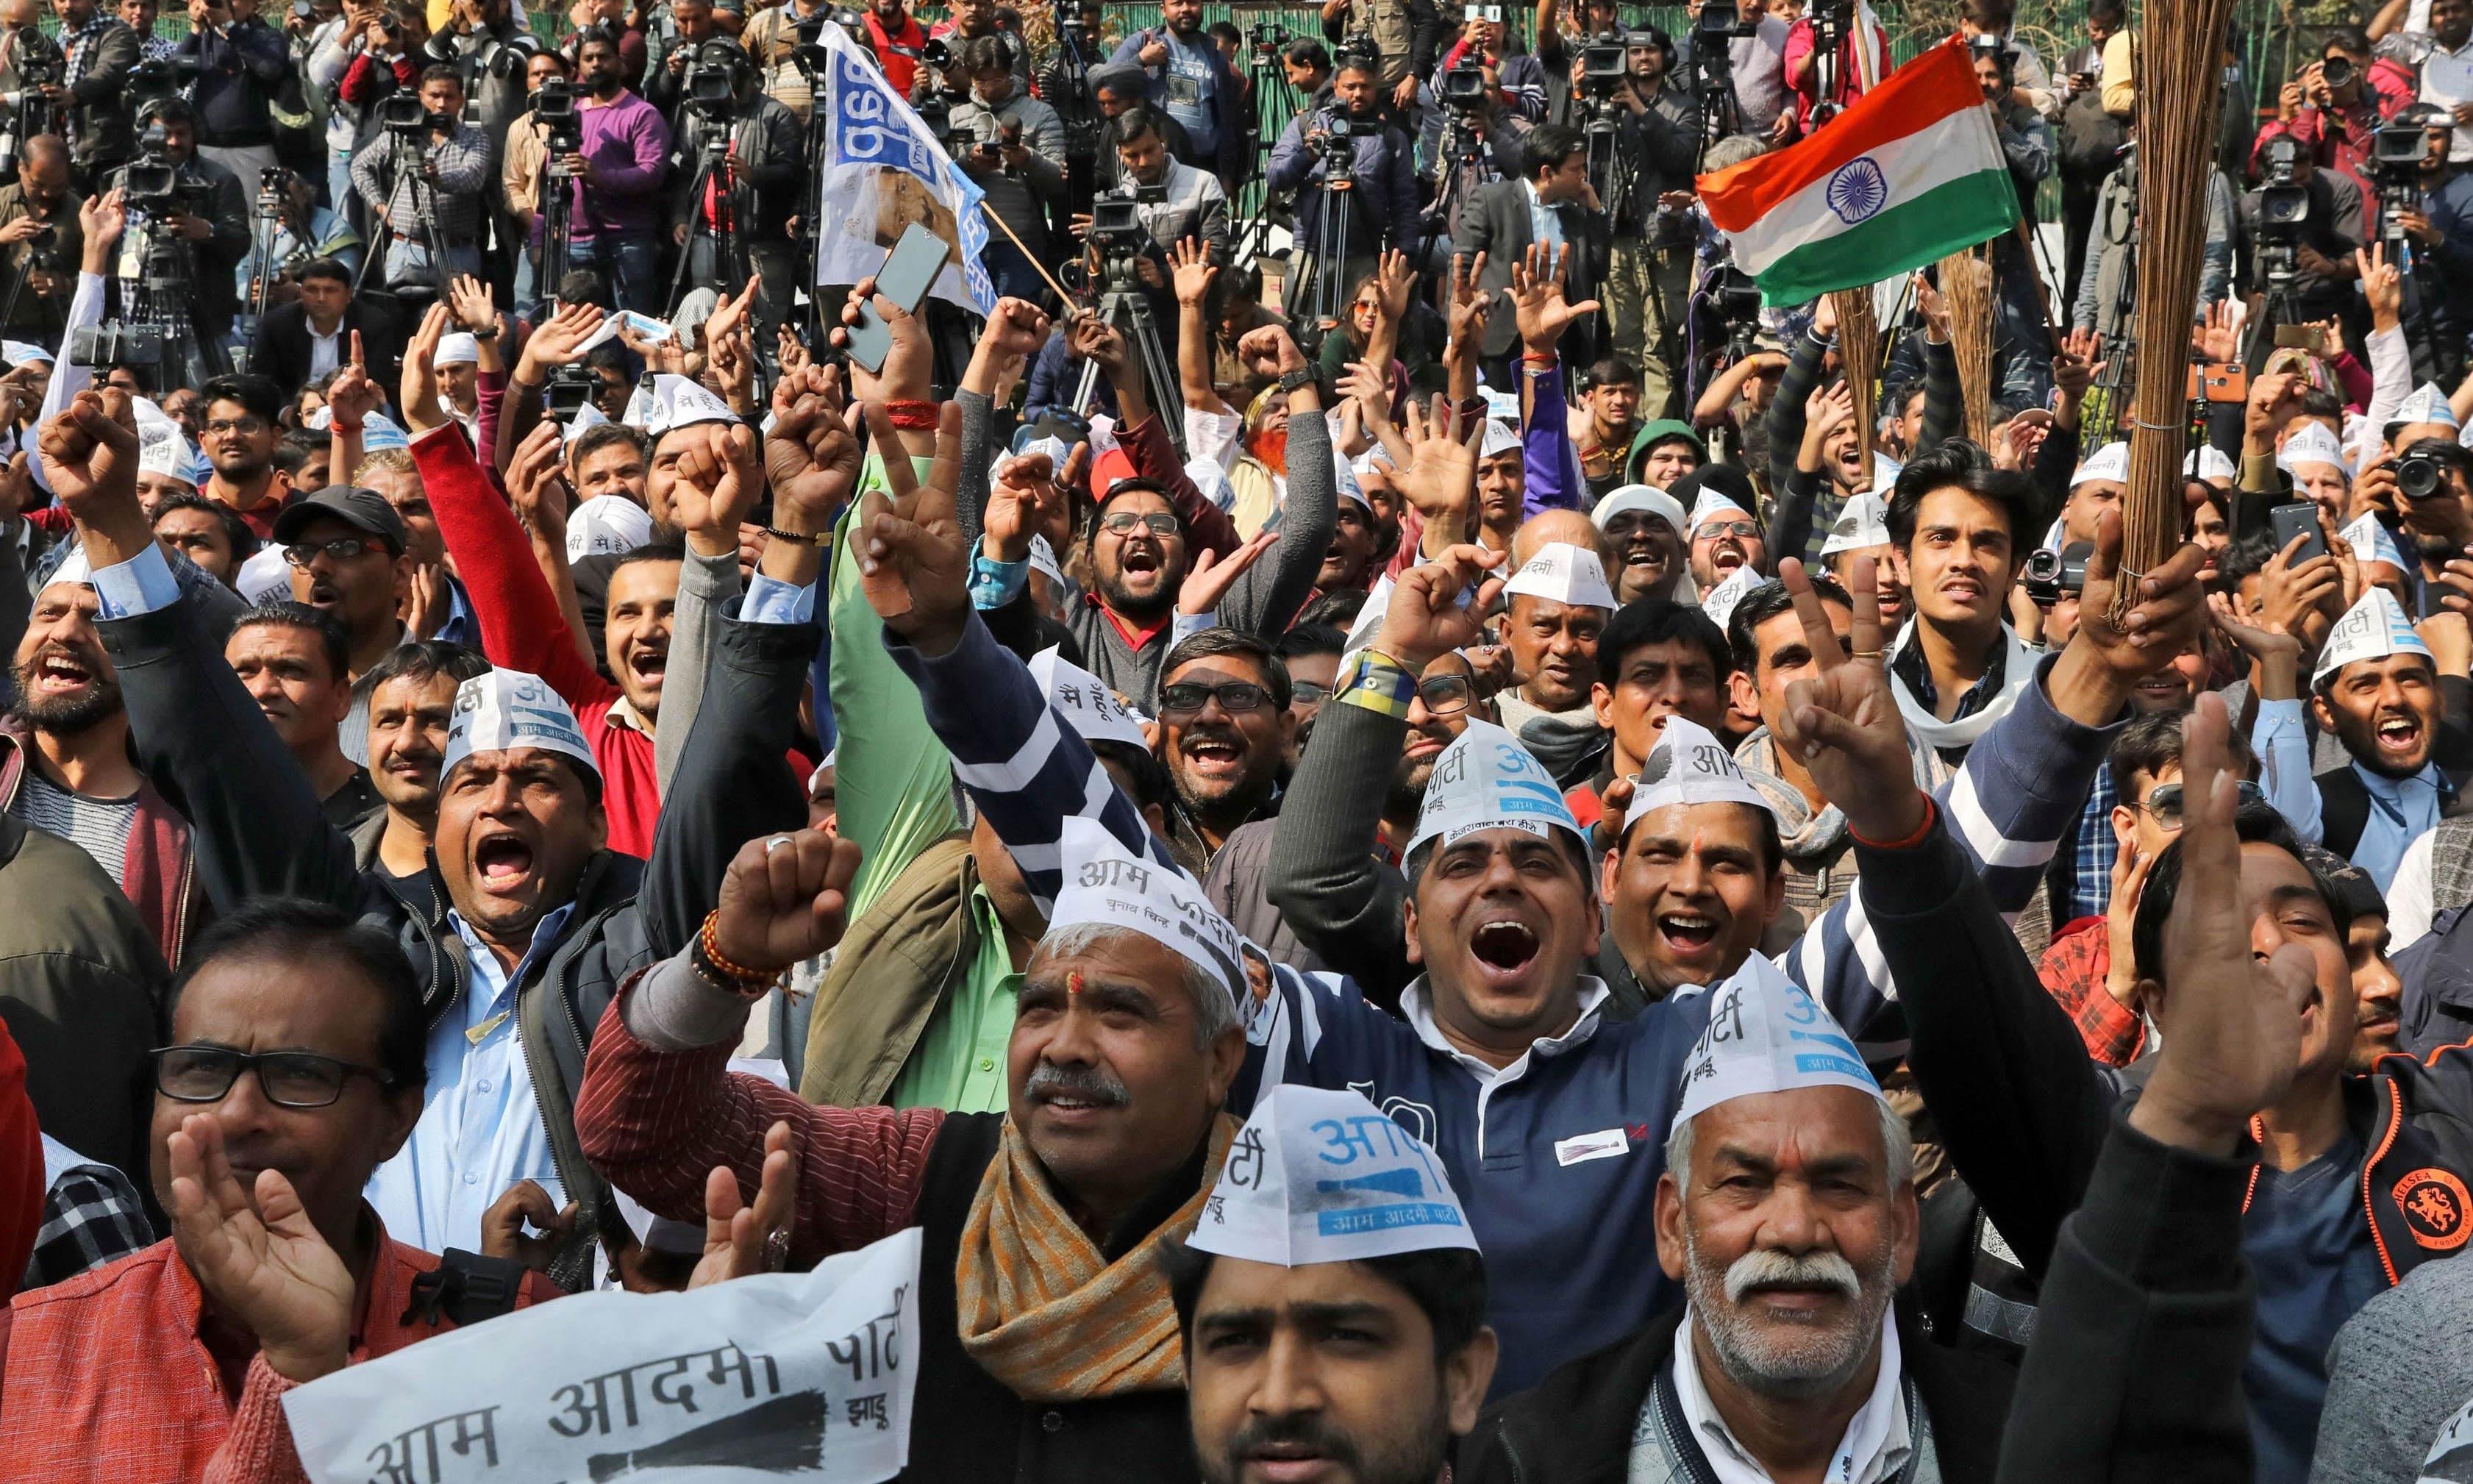 Modi concedes defeat in key New Delhi election